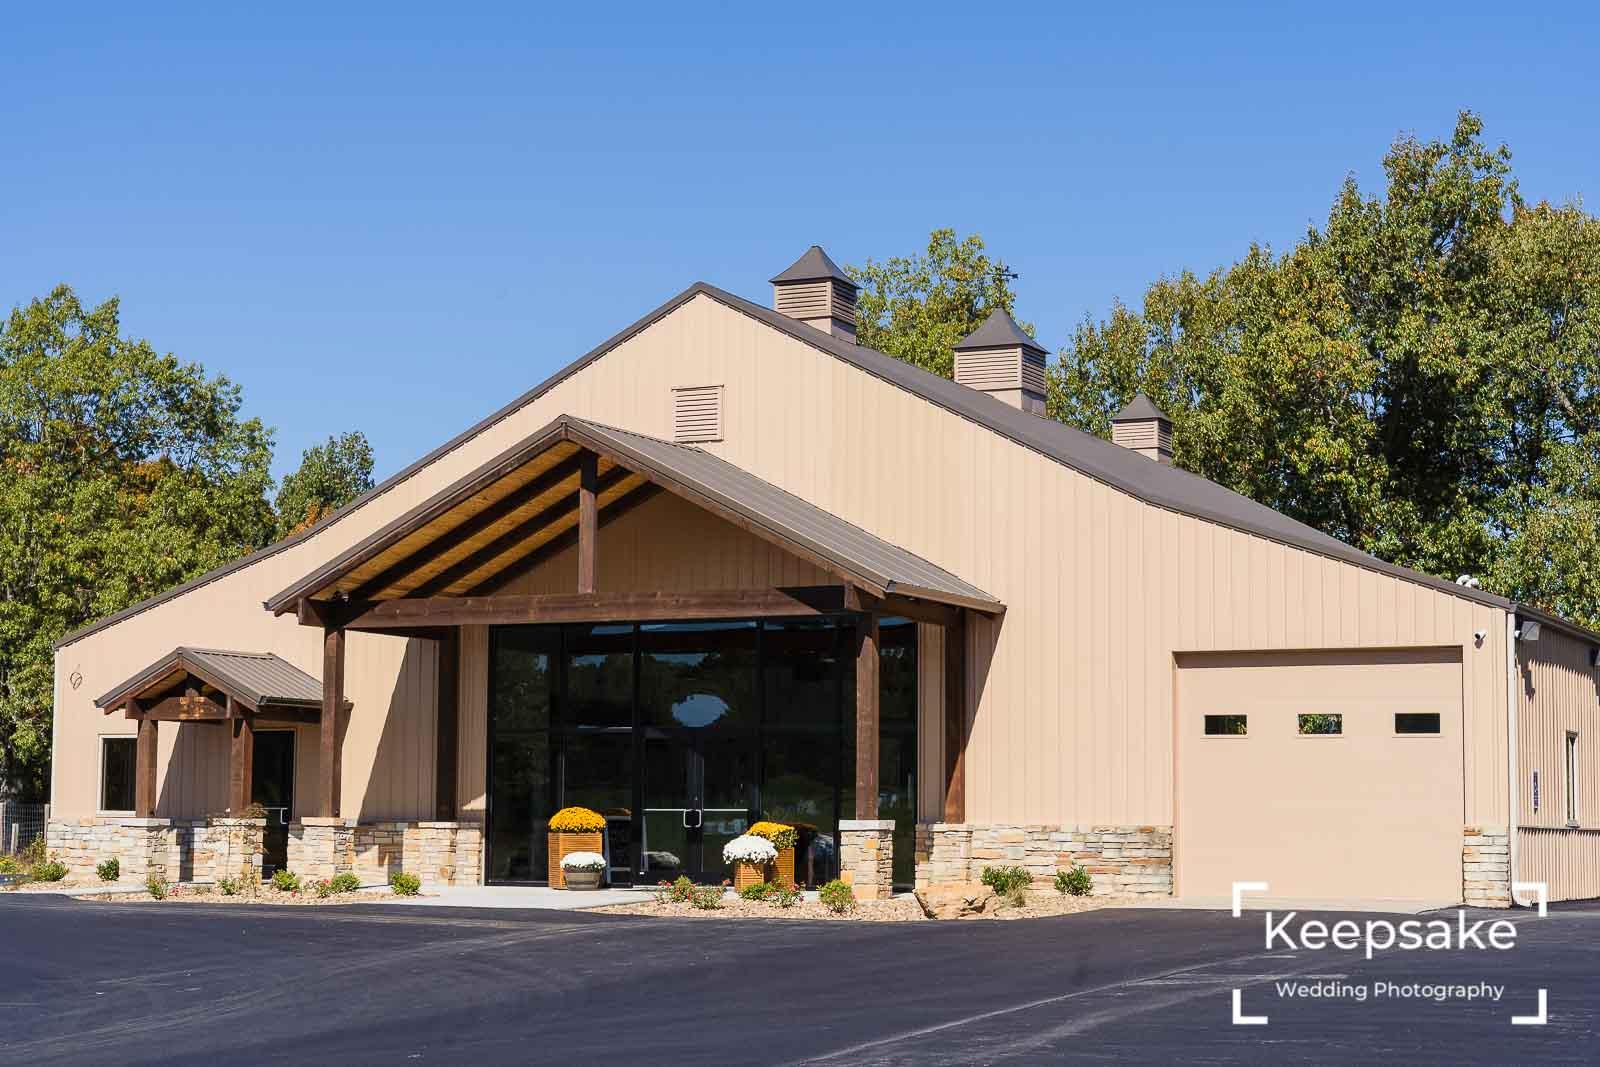 The Event Barn at Mahr Park Arboretum - Keepsake Wedding Photography-1